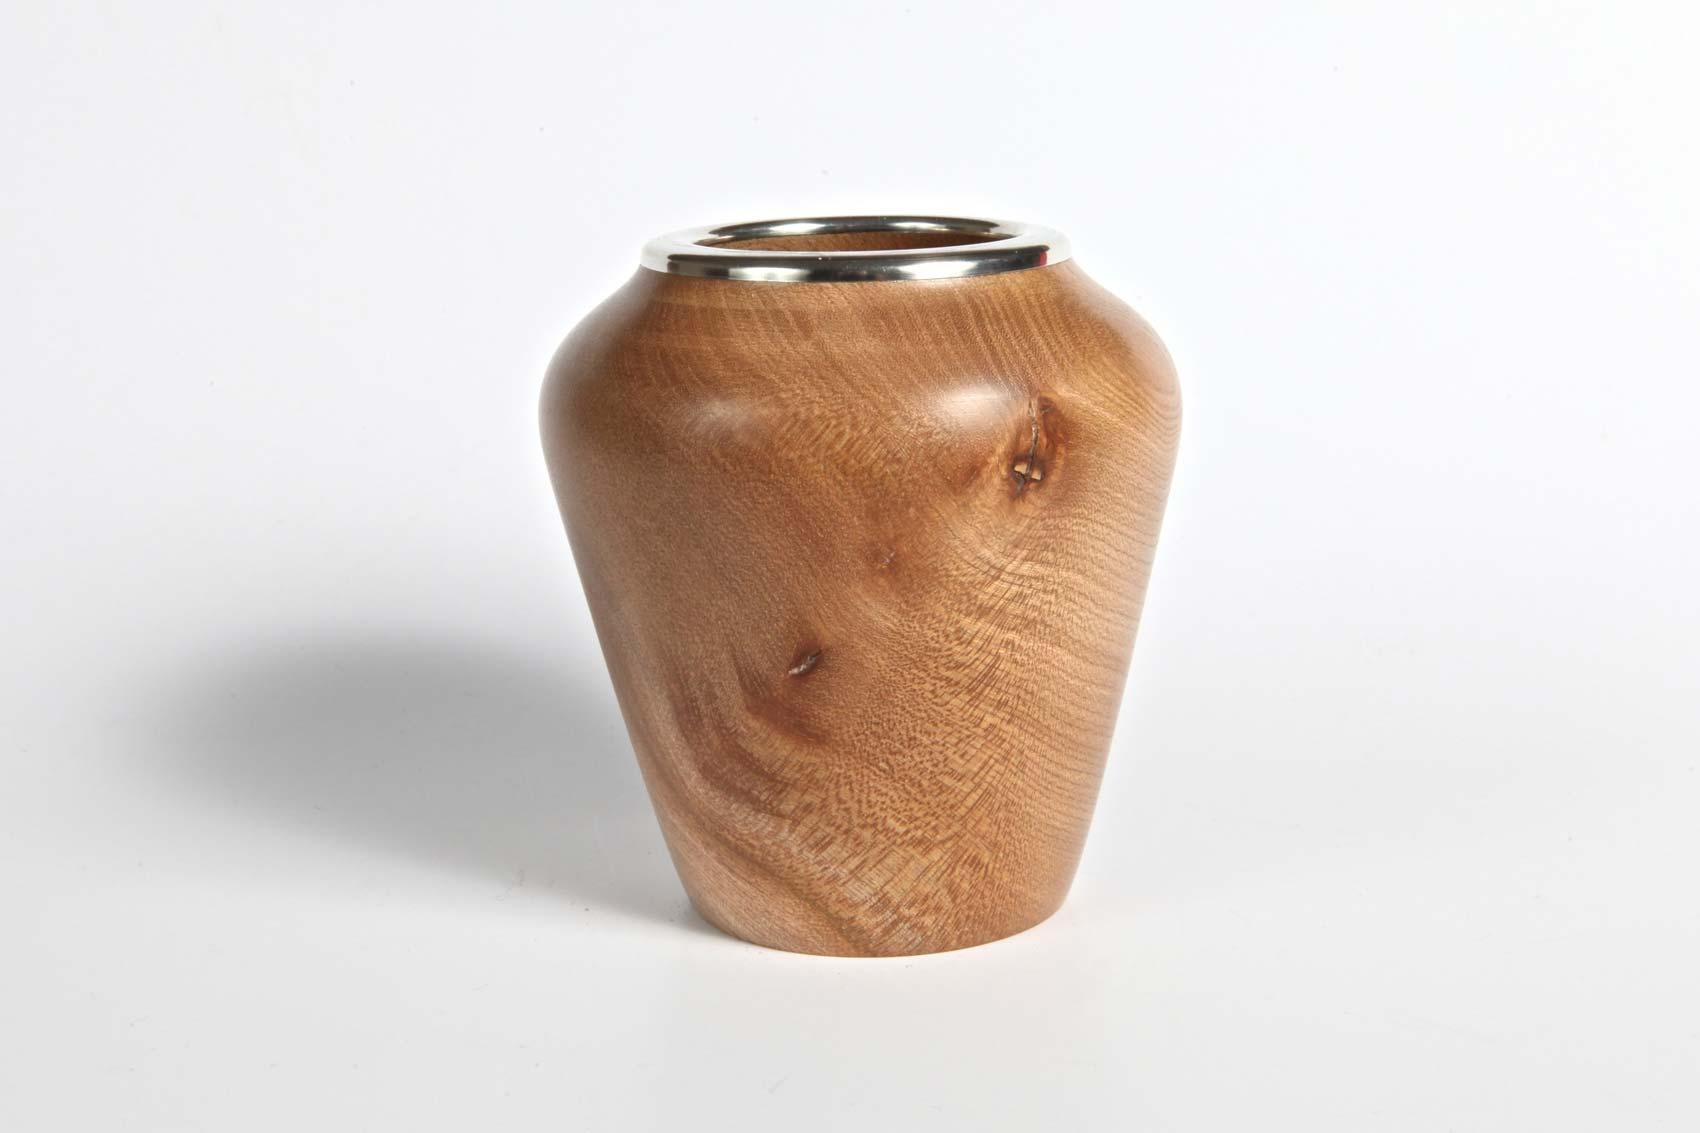 elm-pot-with-pewter-rim-1